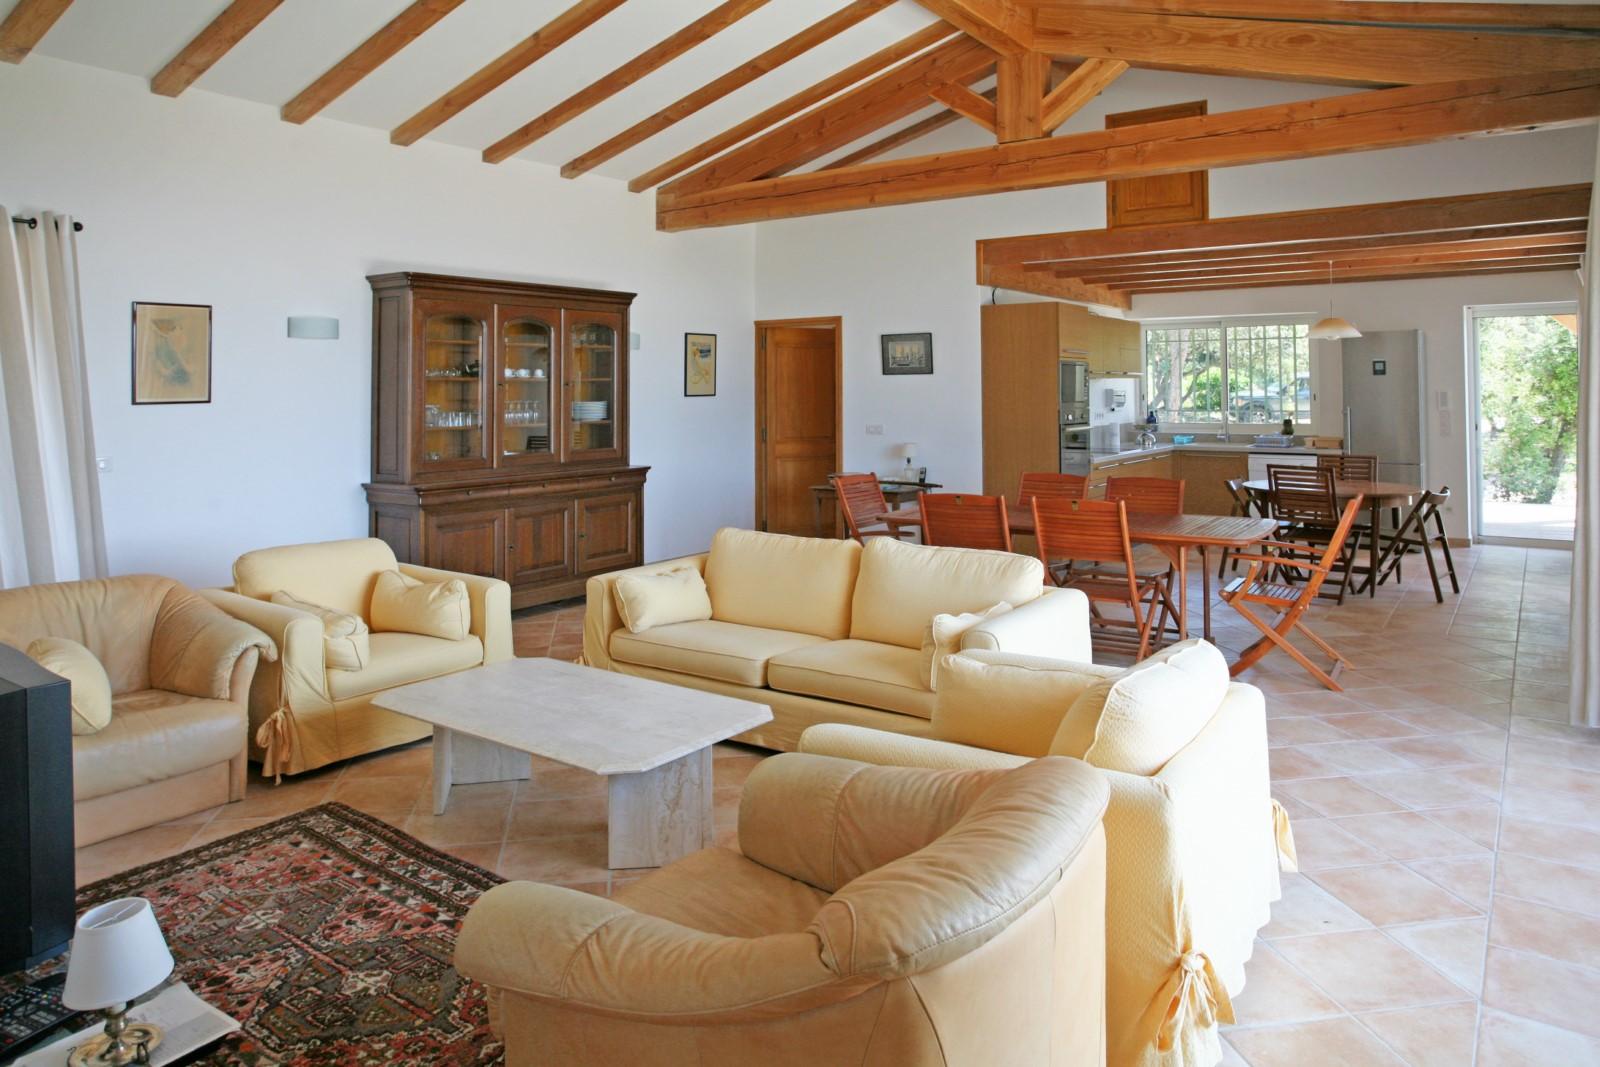 location locations saisonnieres le luberon vos pieds a. Black Bedroom Furniture Sets. Home Design Ideas